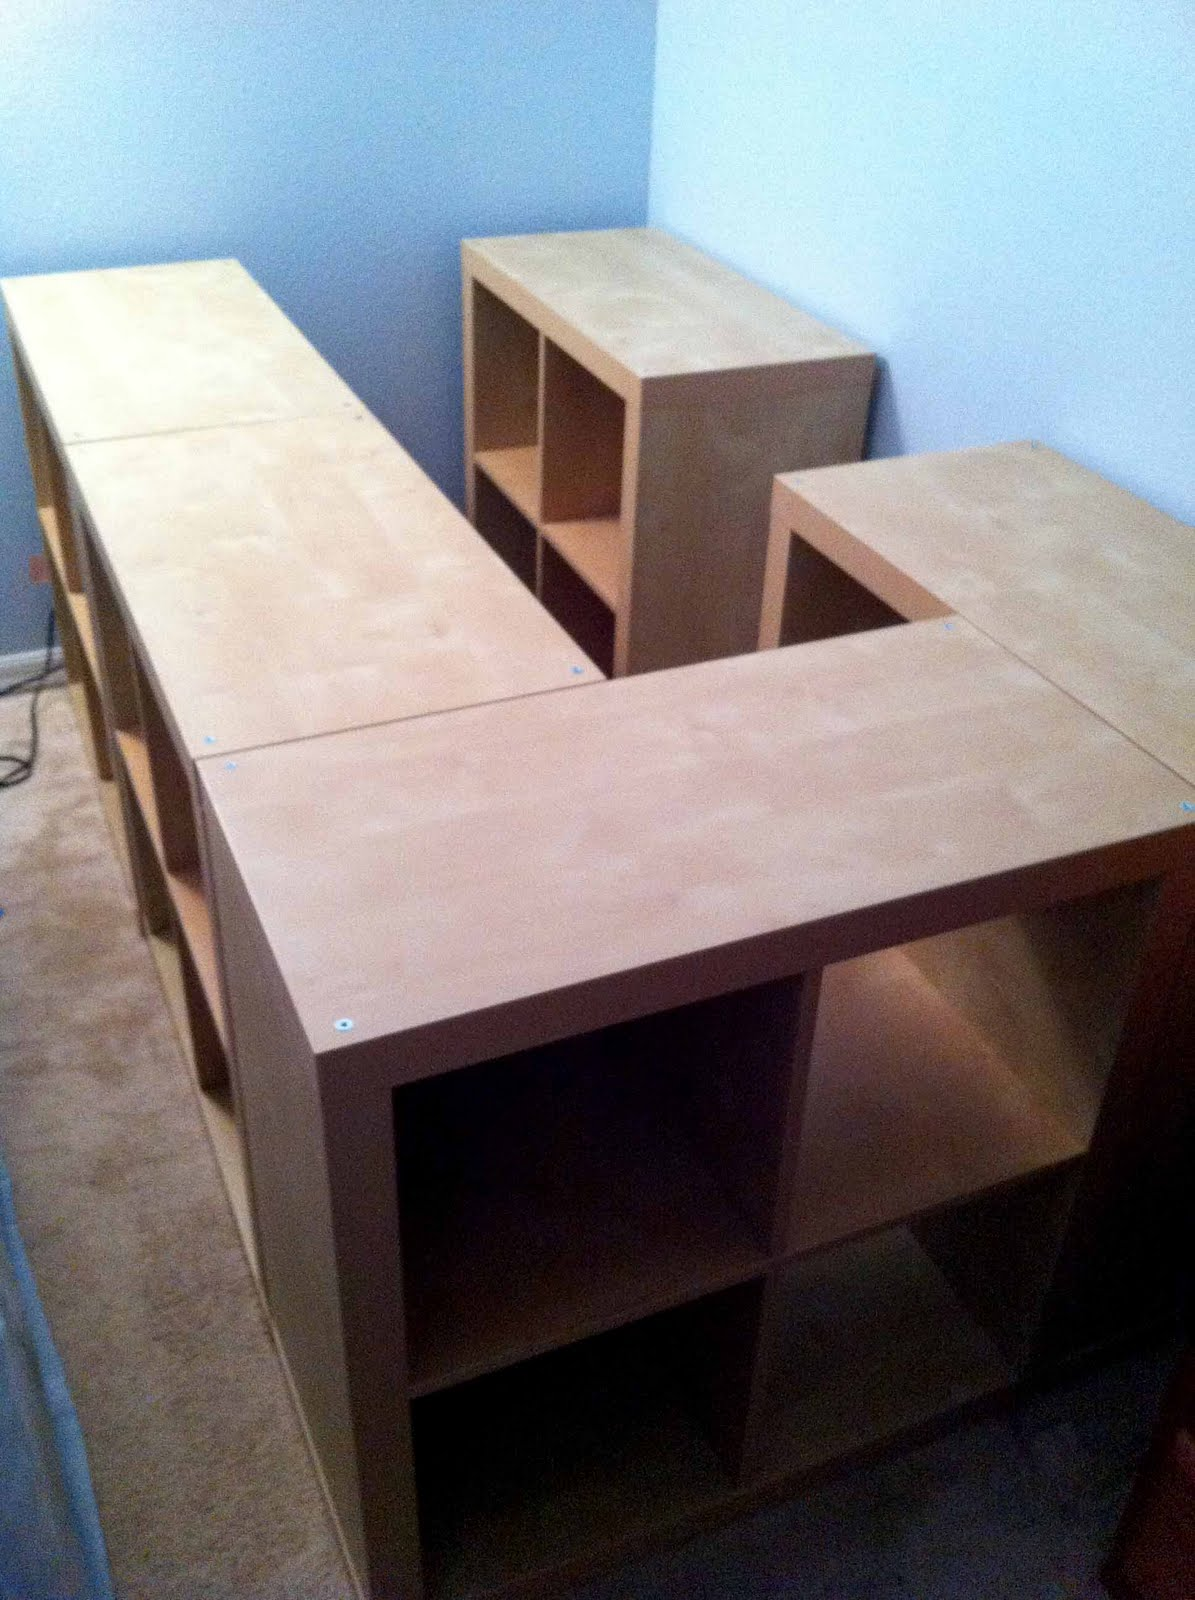 Expedit storage bed ~ Get Home Decorating